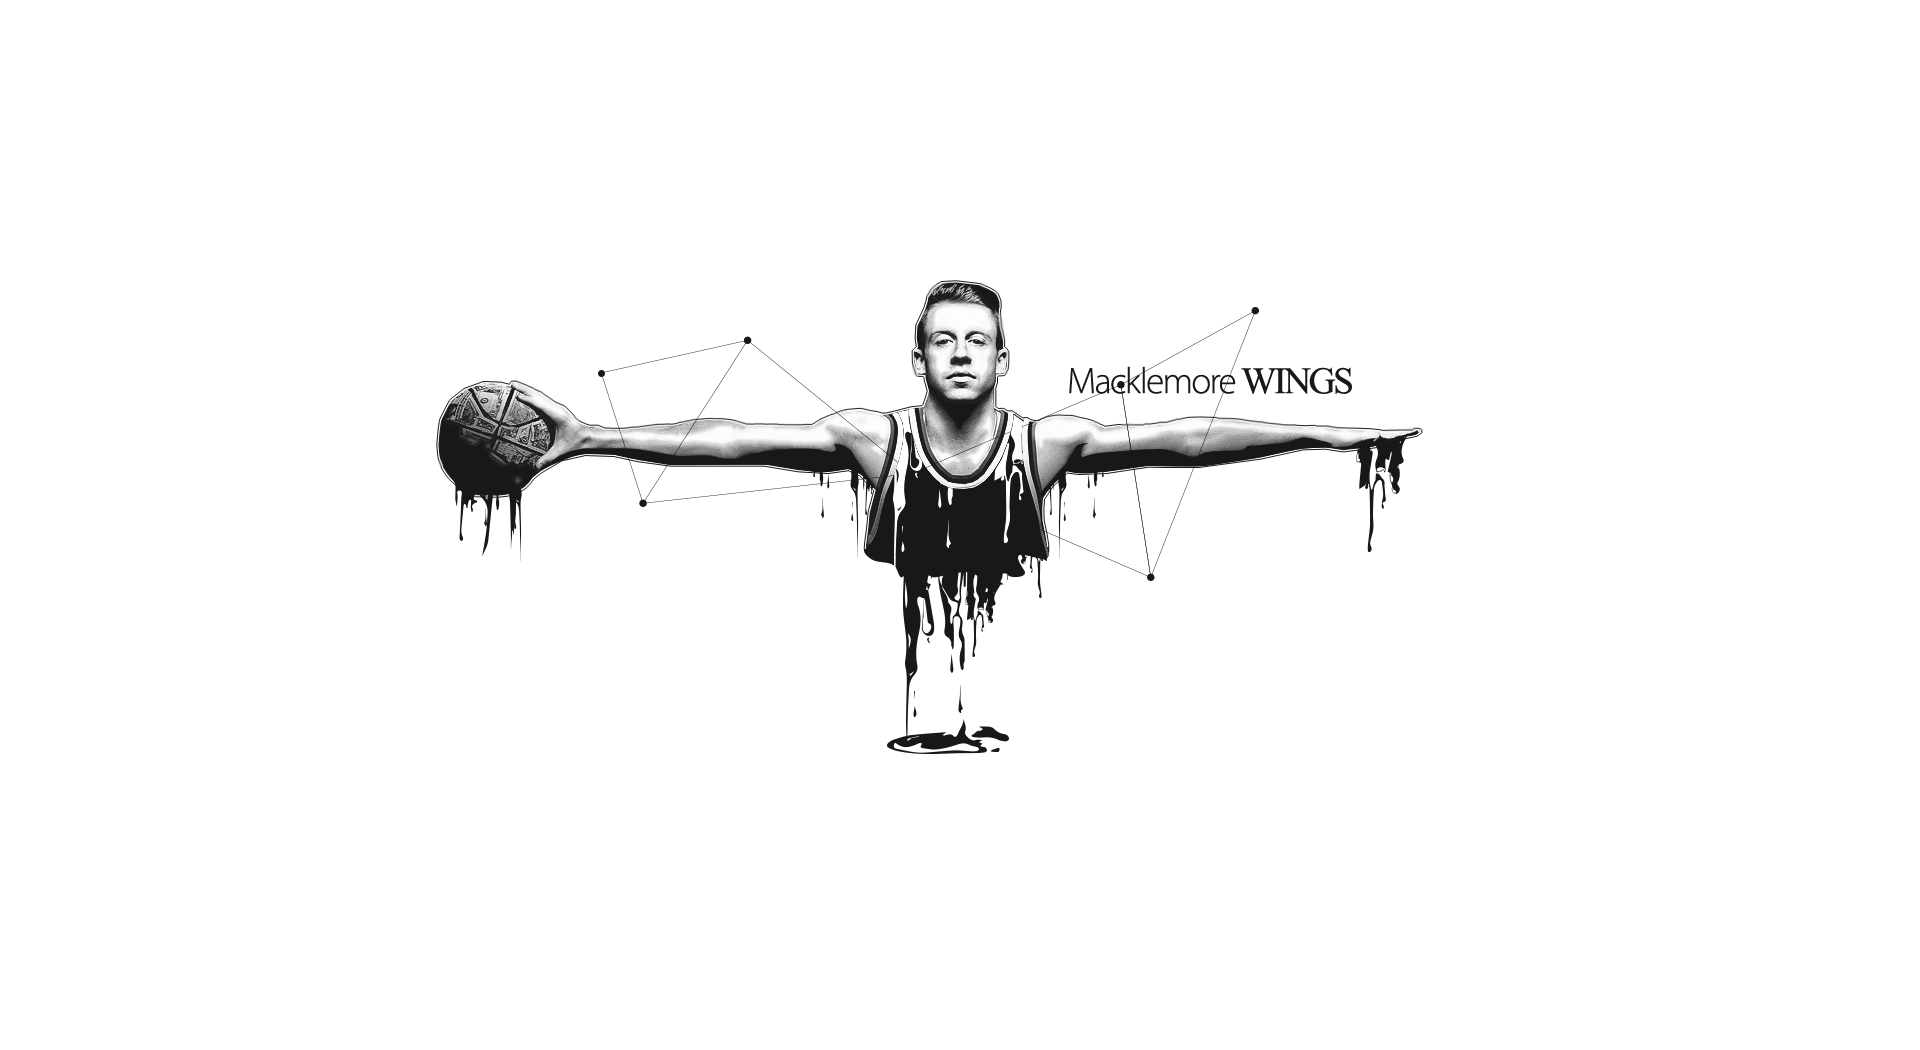 Macklemore Wings - Wallpaper by FUNKiNATiON on DeviantArt